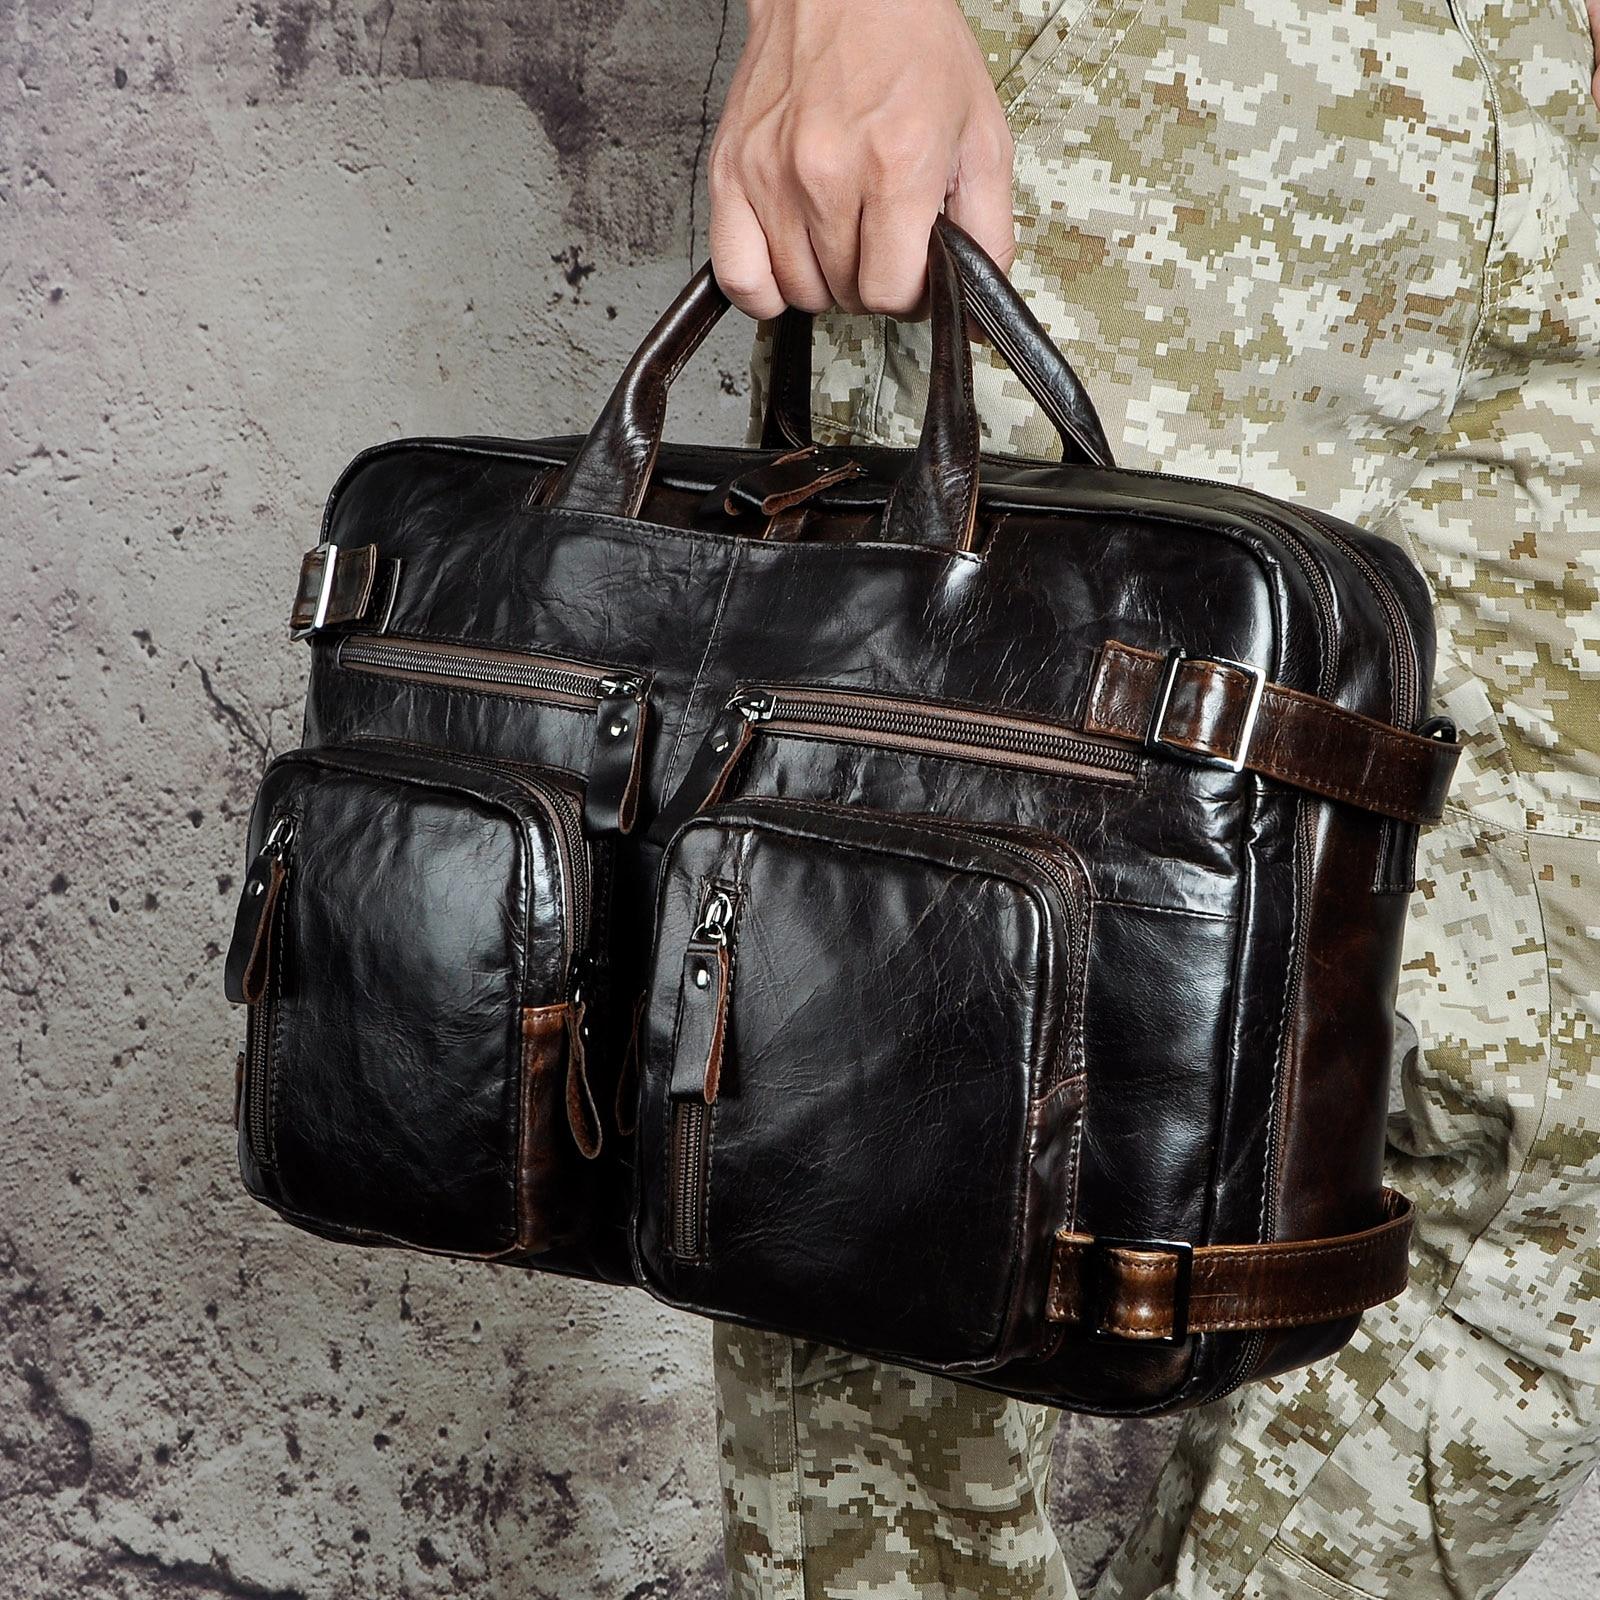 Genuine Real Leather Fashion Business Briefcase Messenger Bag Male Design Travel Laptop Document Case Tote Portfolio Bag k1013c